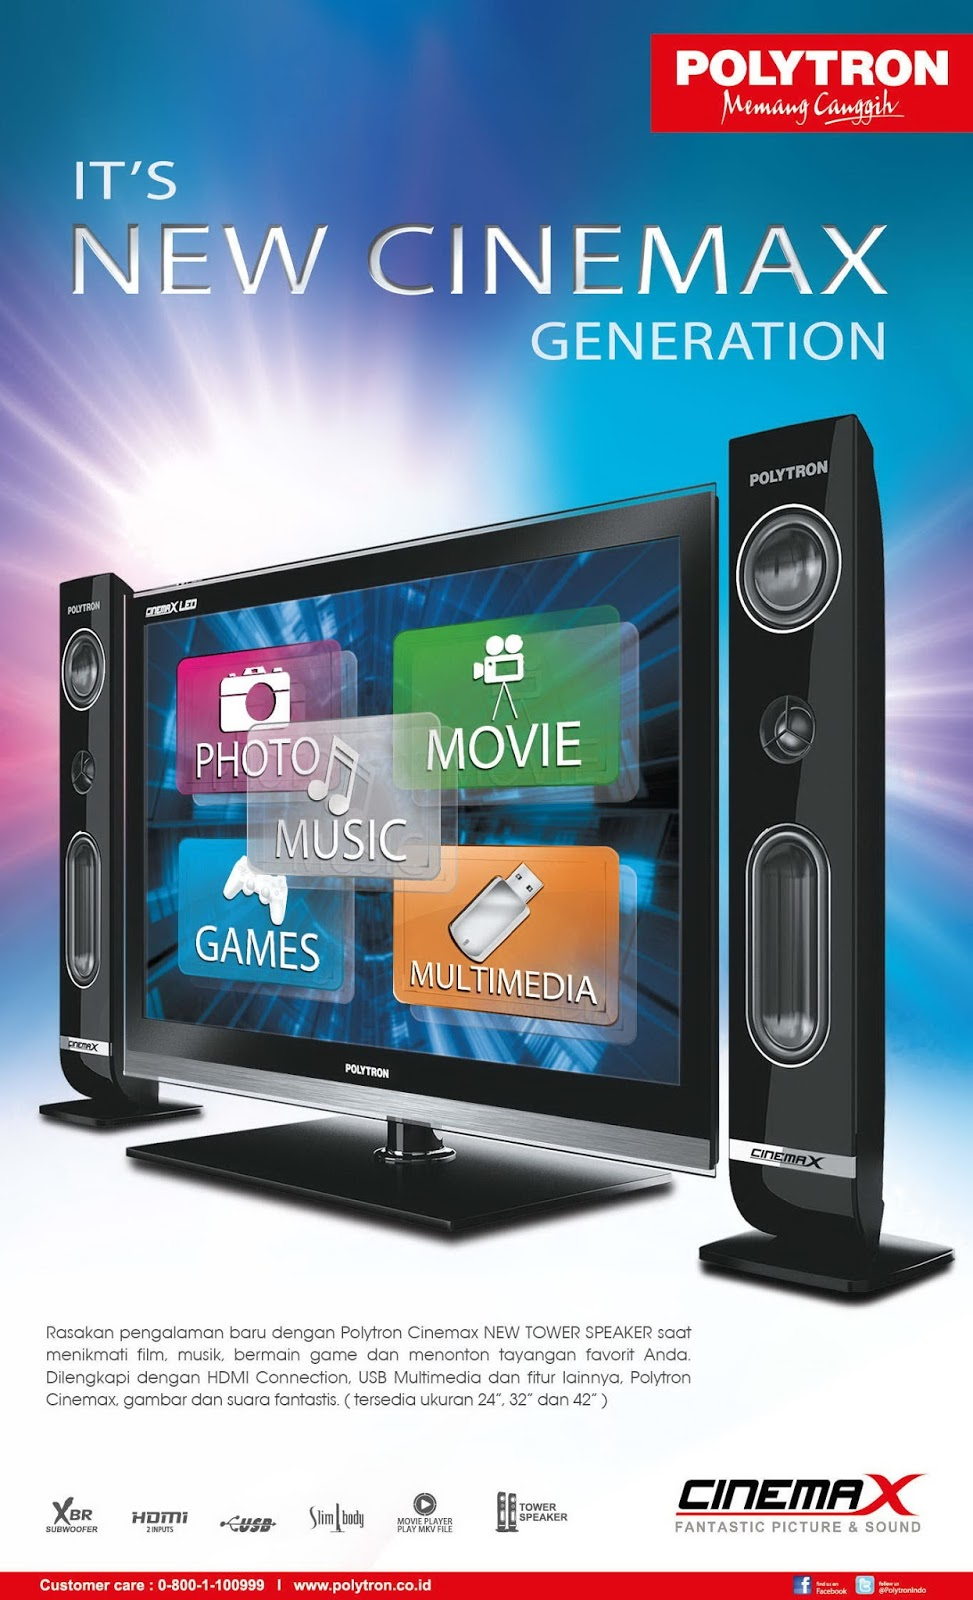 harga terbaru lcd tv newhairstylesformen2014